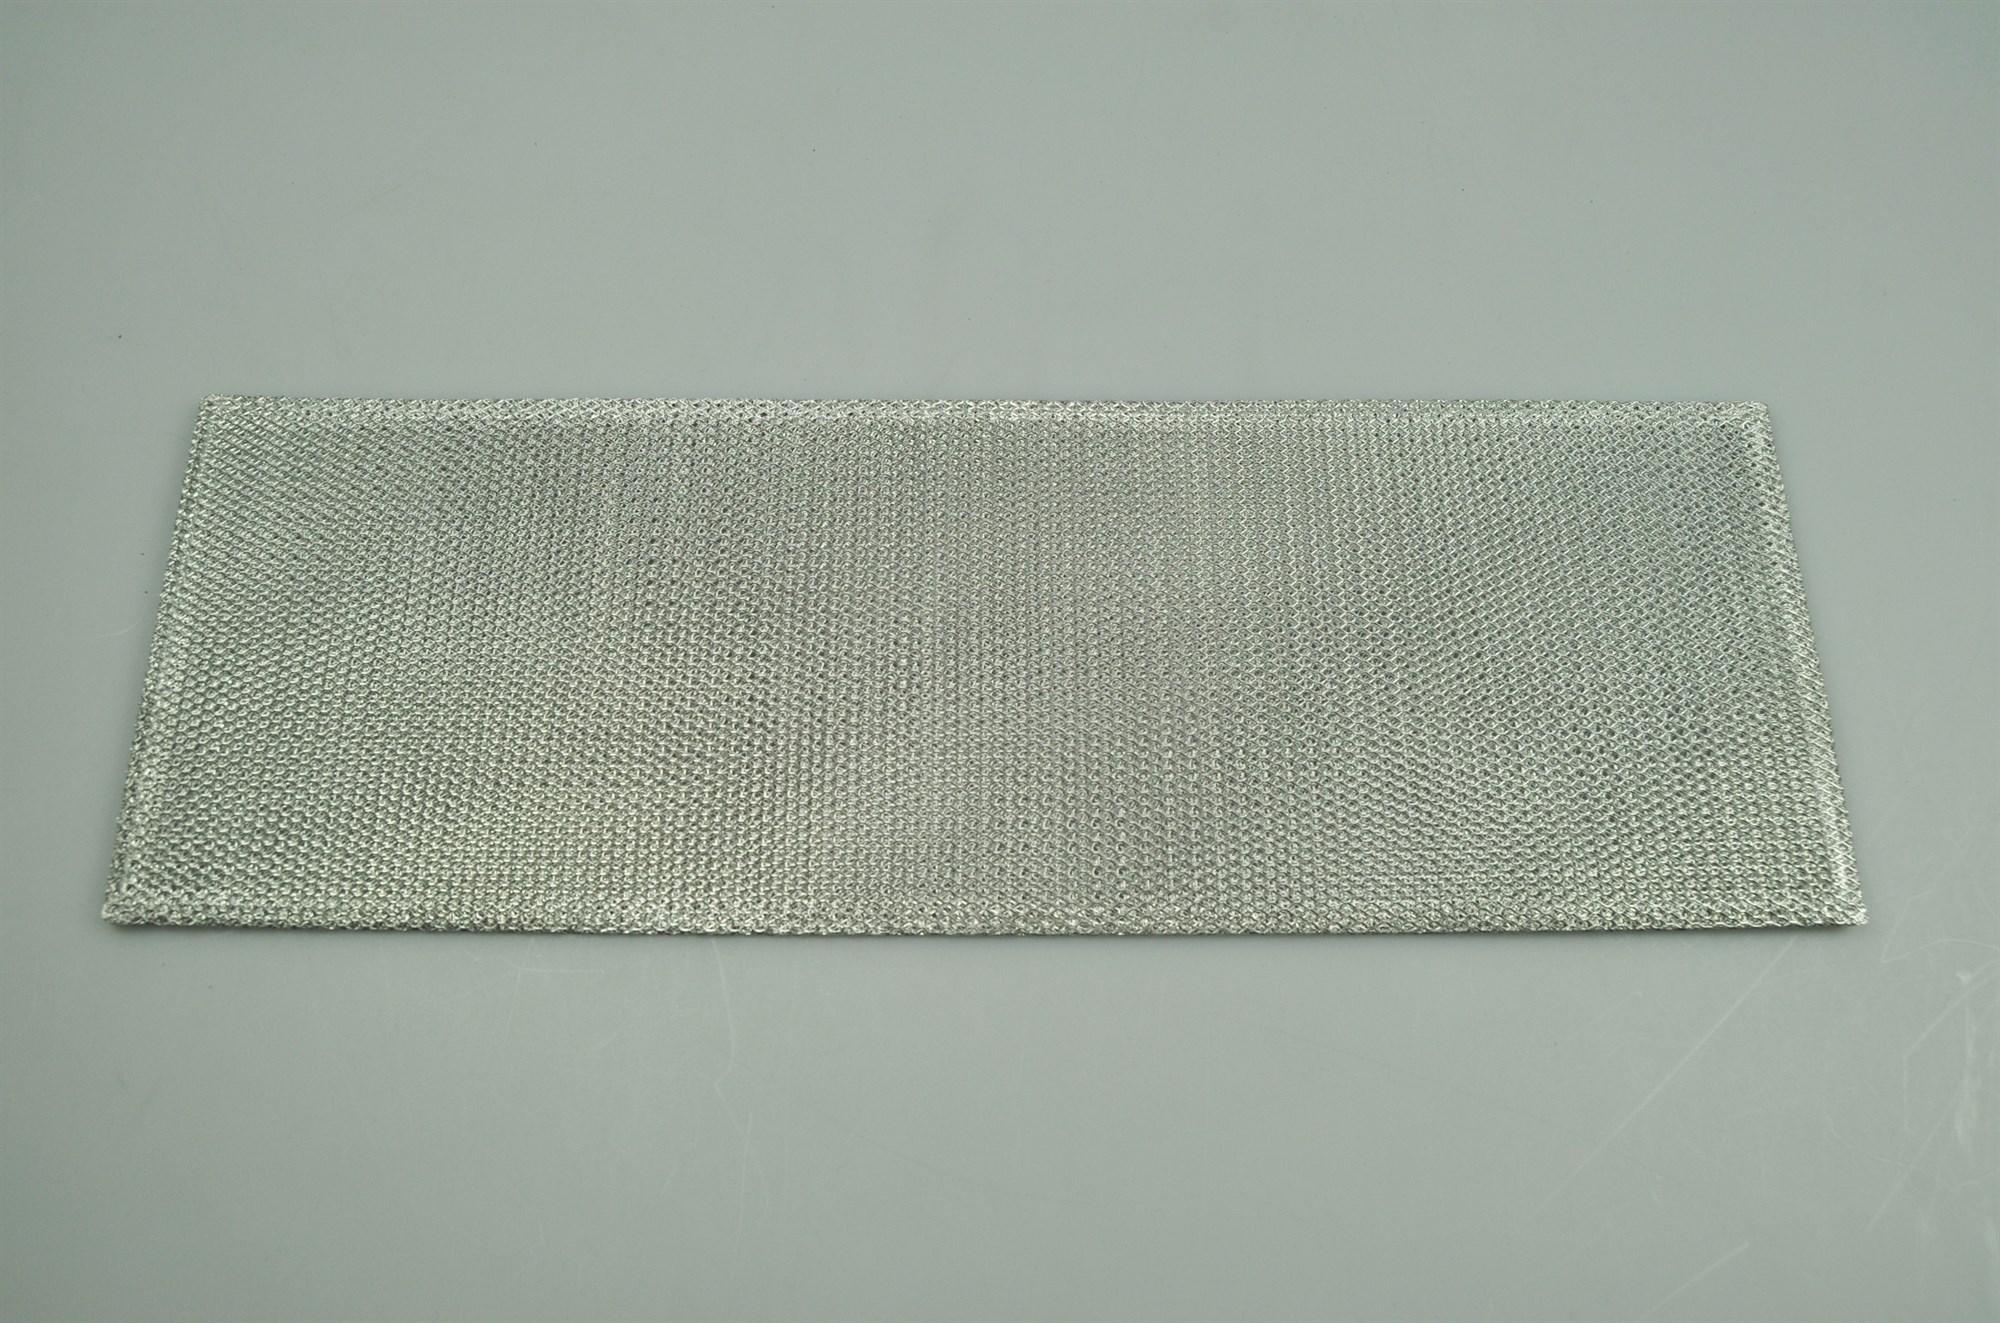 Metallfilter juno dunstabzugshaube